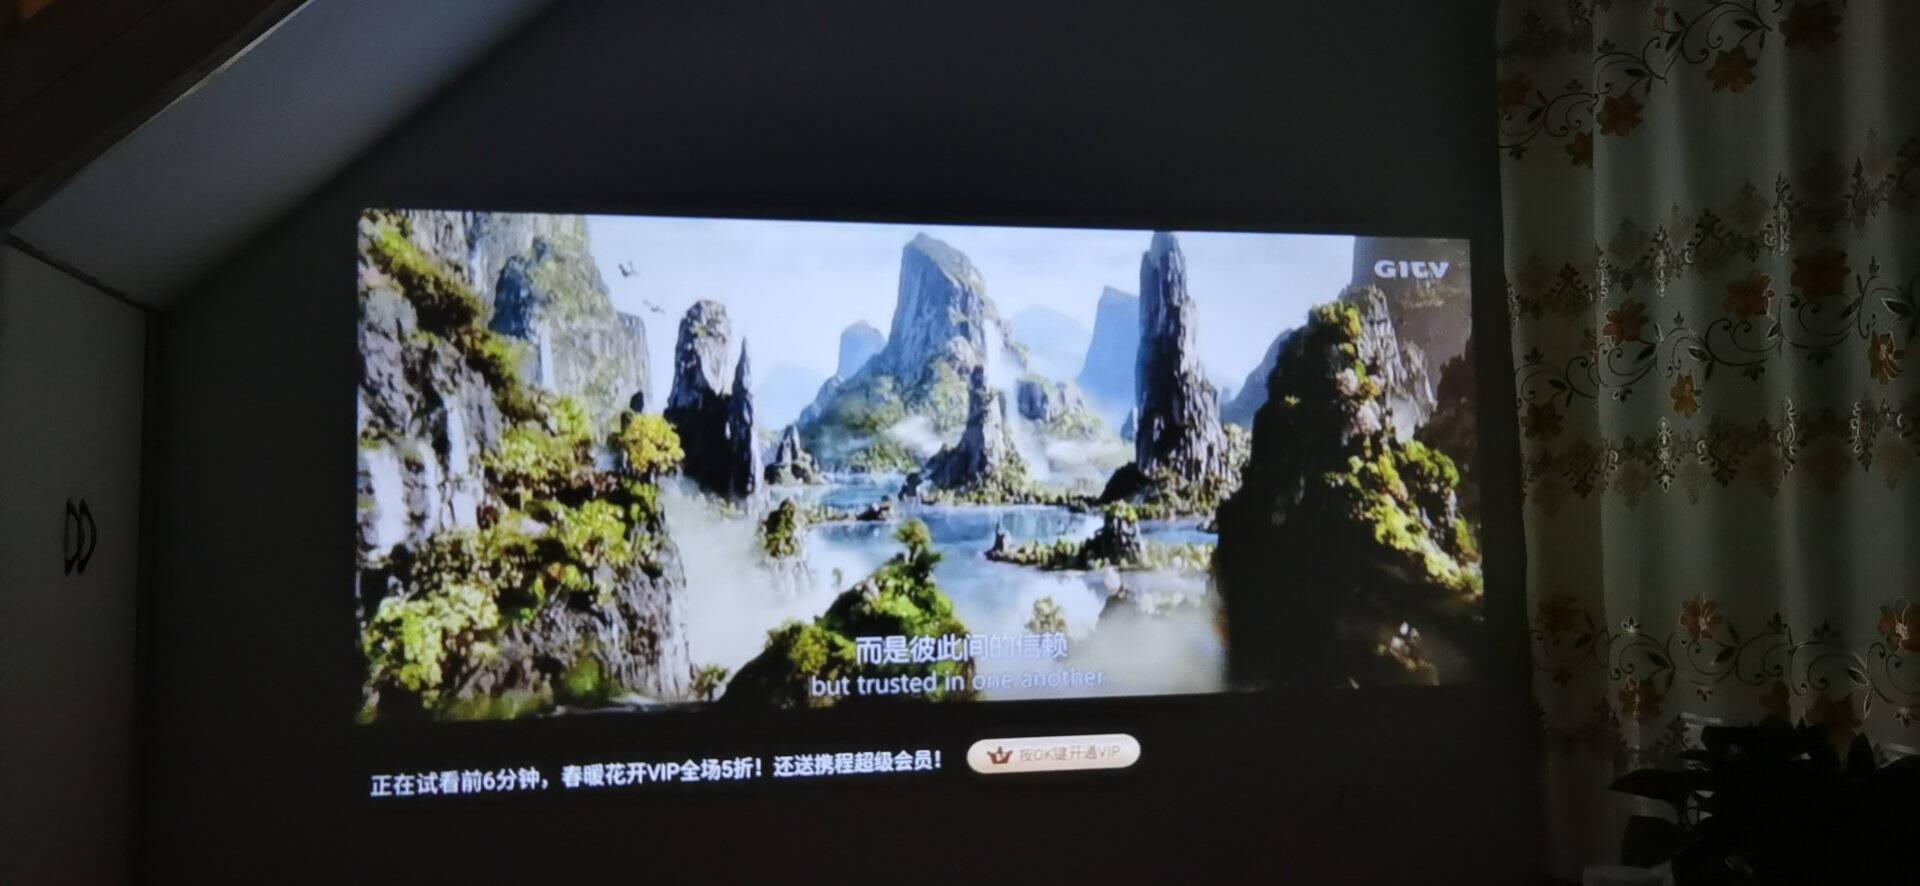 【4K高清白天直投】轰天炮投影仪家用便携办公4K全高清1080P无线wifi投影机3d智能激光电视香槟金S-180(全高清4K+白天直投)